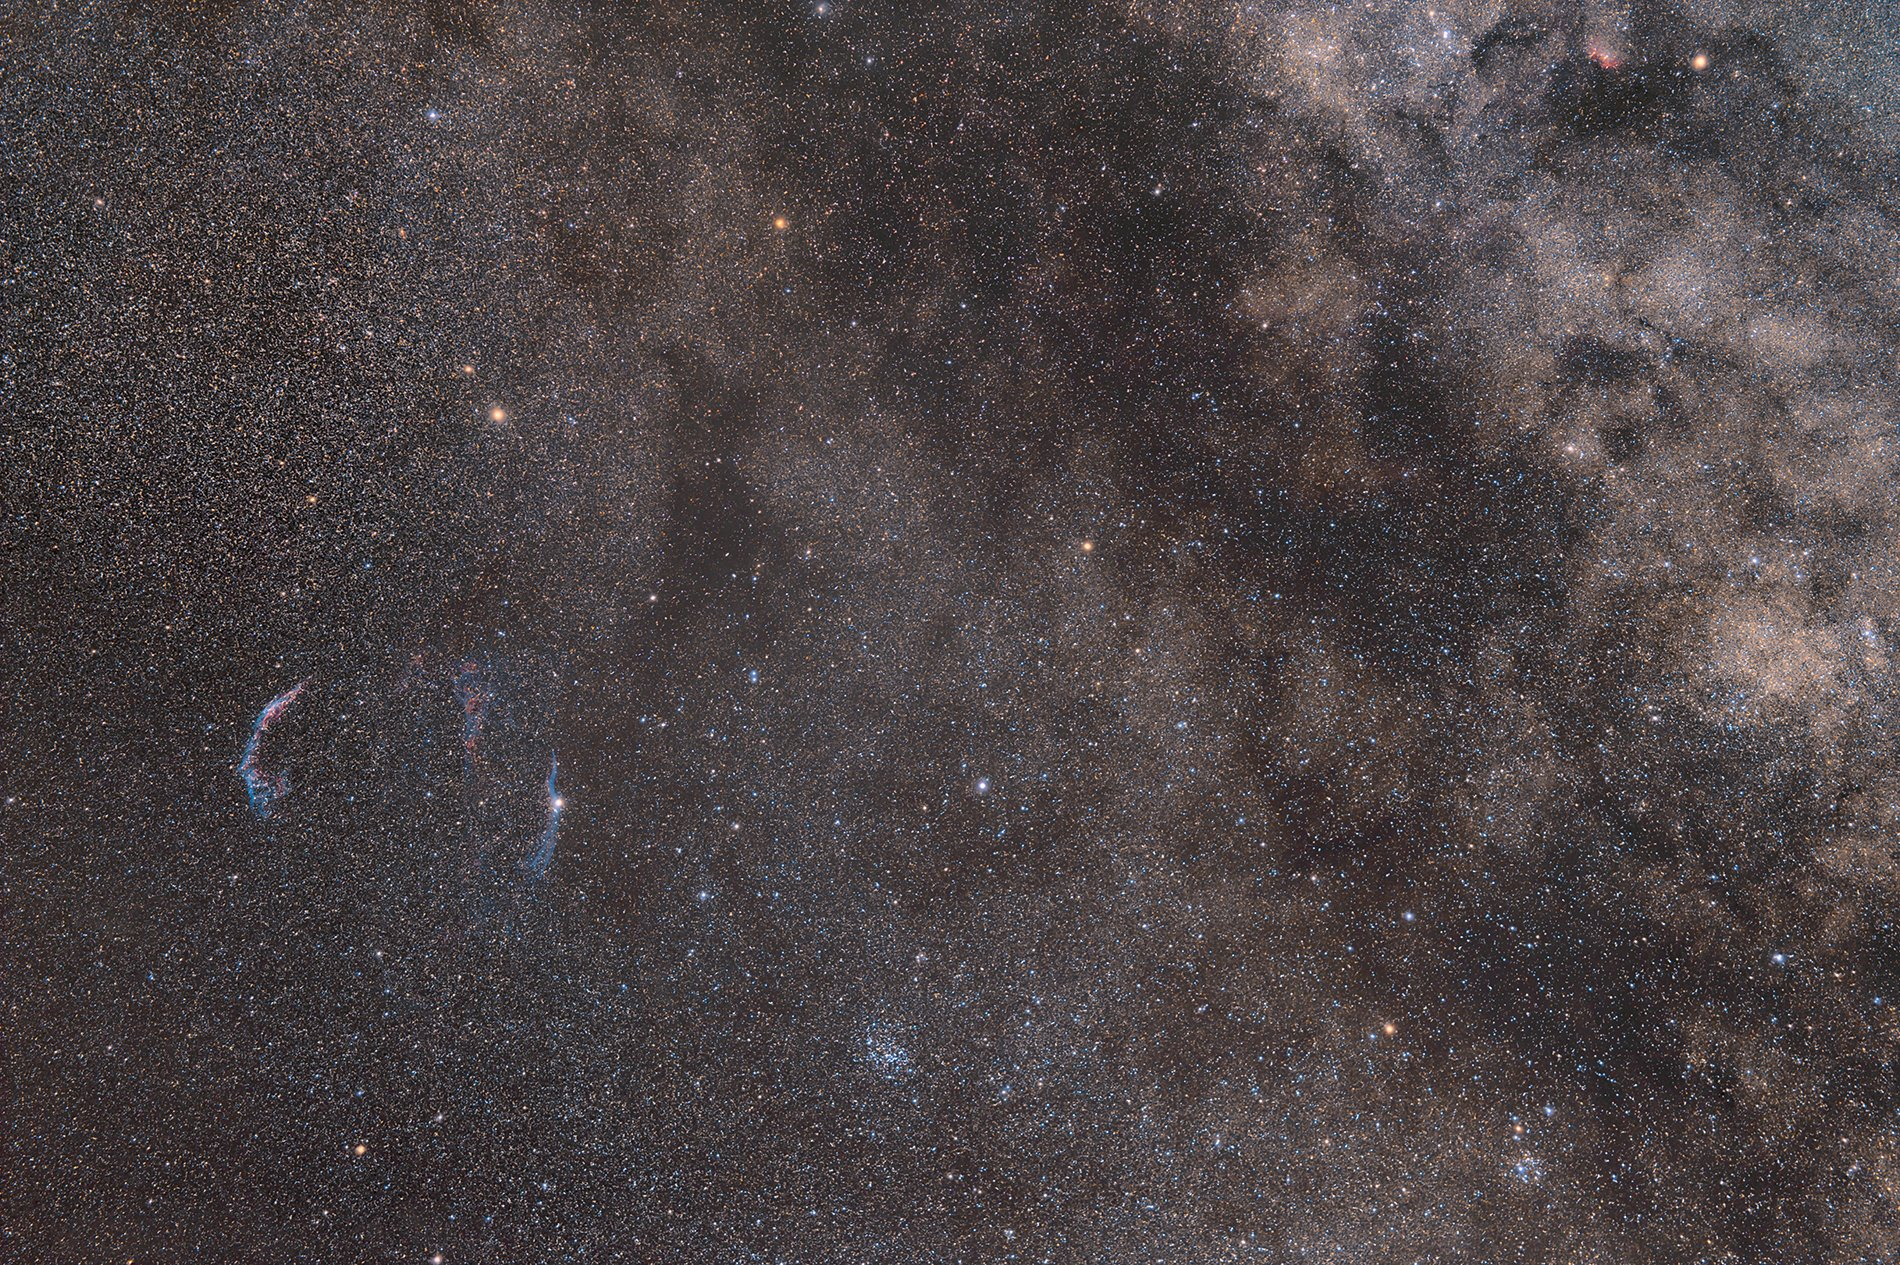 астрофото, фото космоса, Кузнецов Сергей